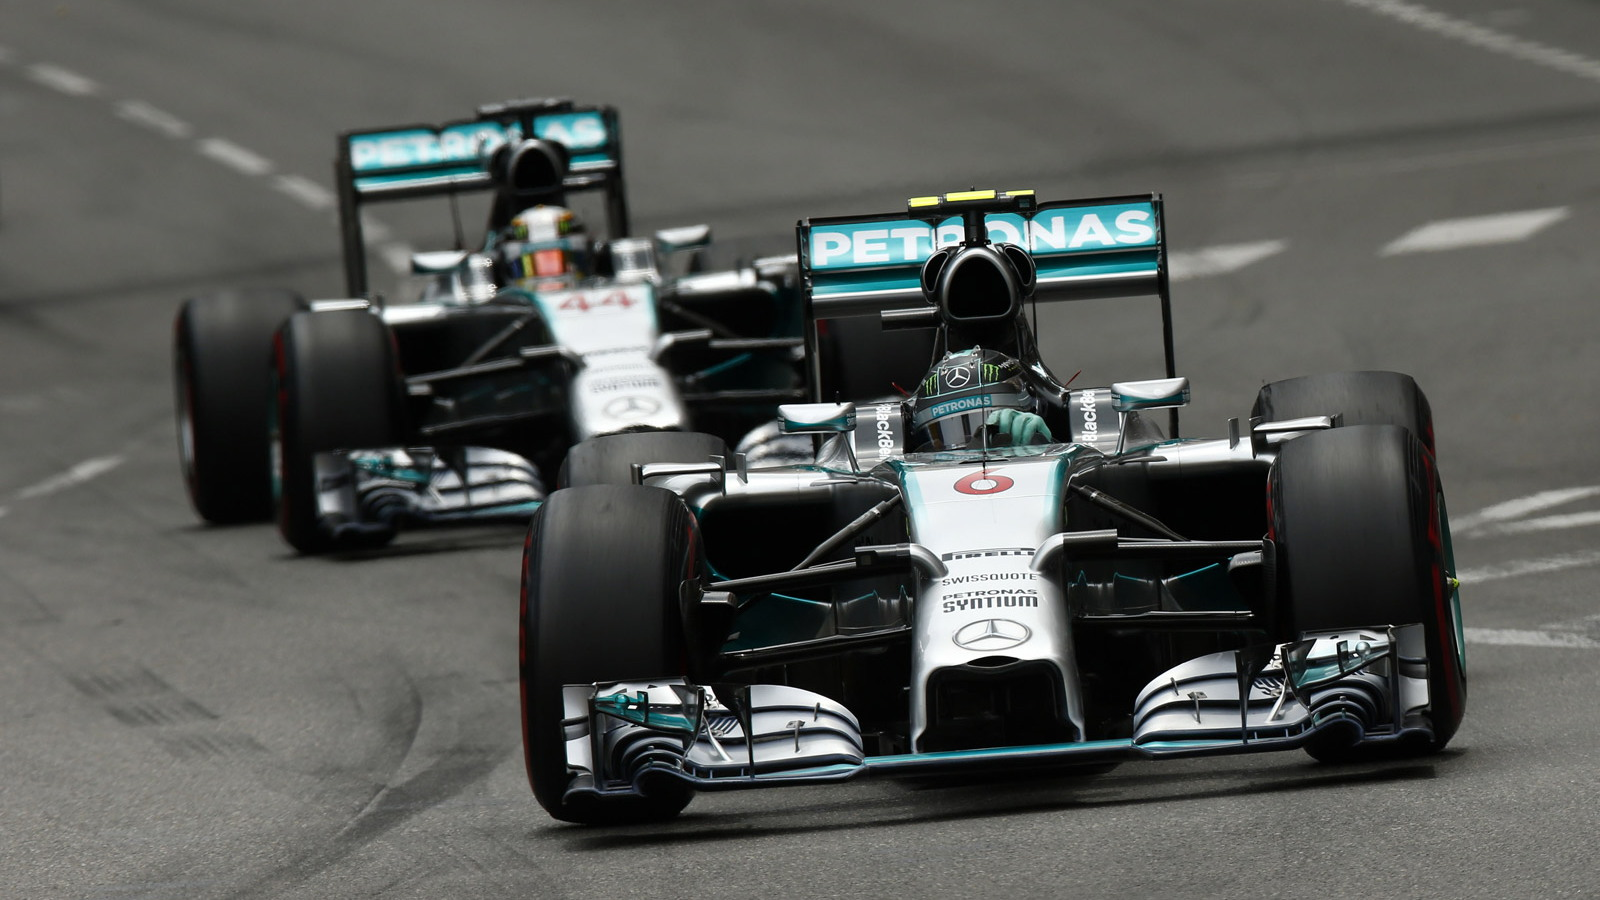 Mercedes AMG at the 2014 Formula One Monaco Grand Prix